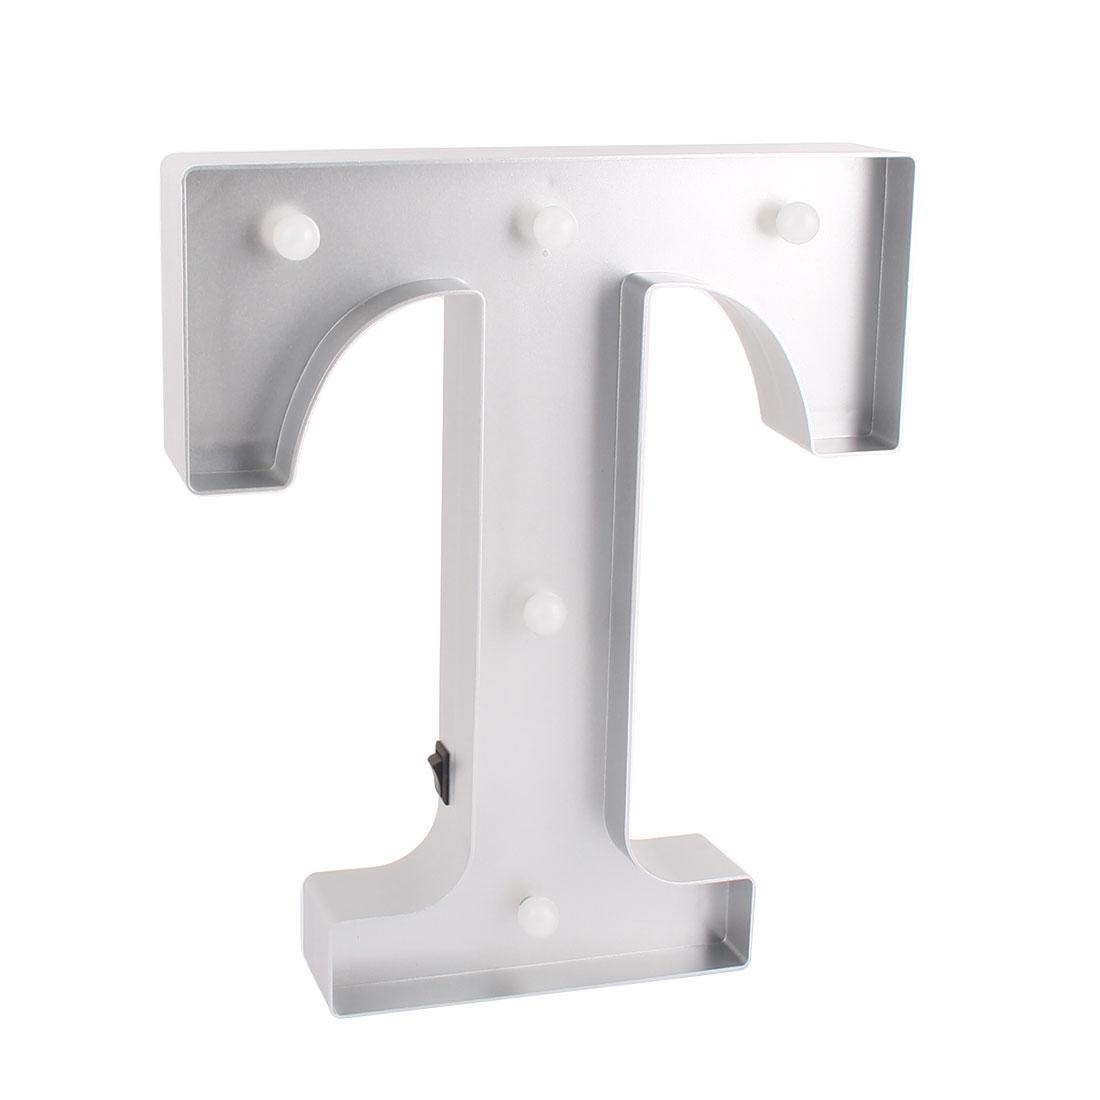 Bedroom Plastic Decor English T Letter Alphabet Word Free DIY LED Light Silver Tone